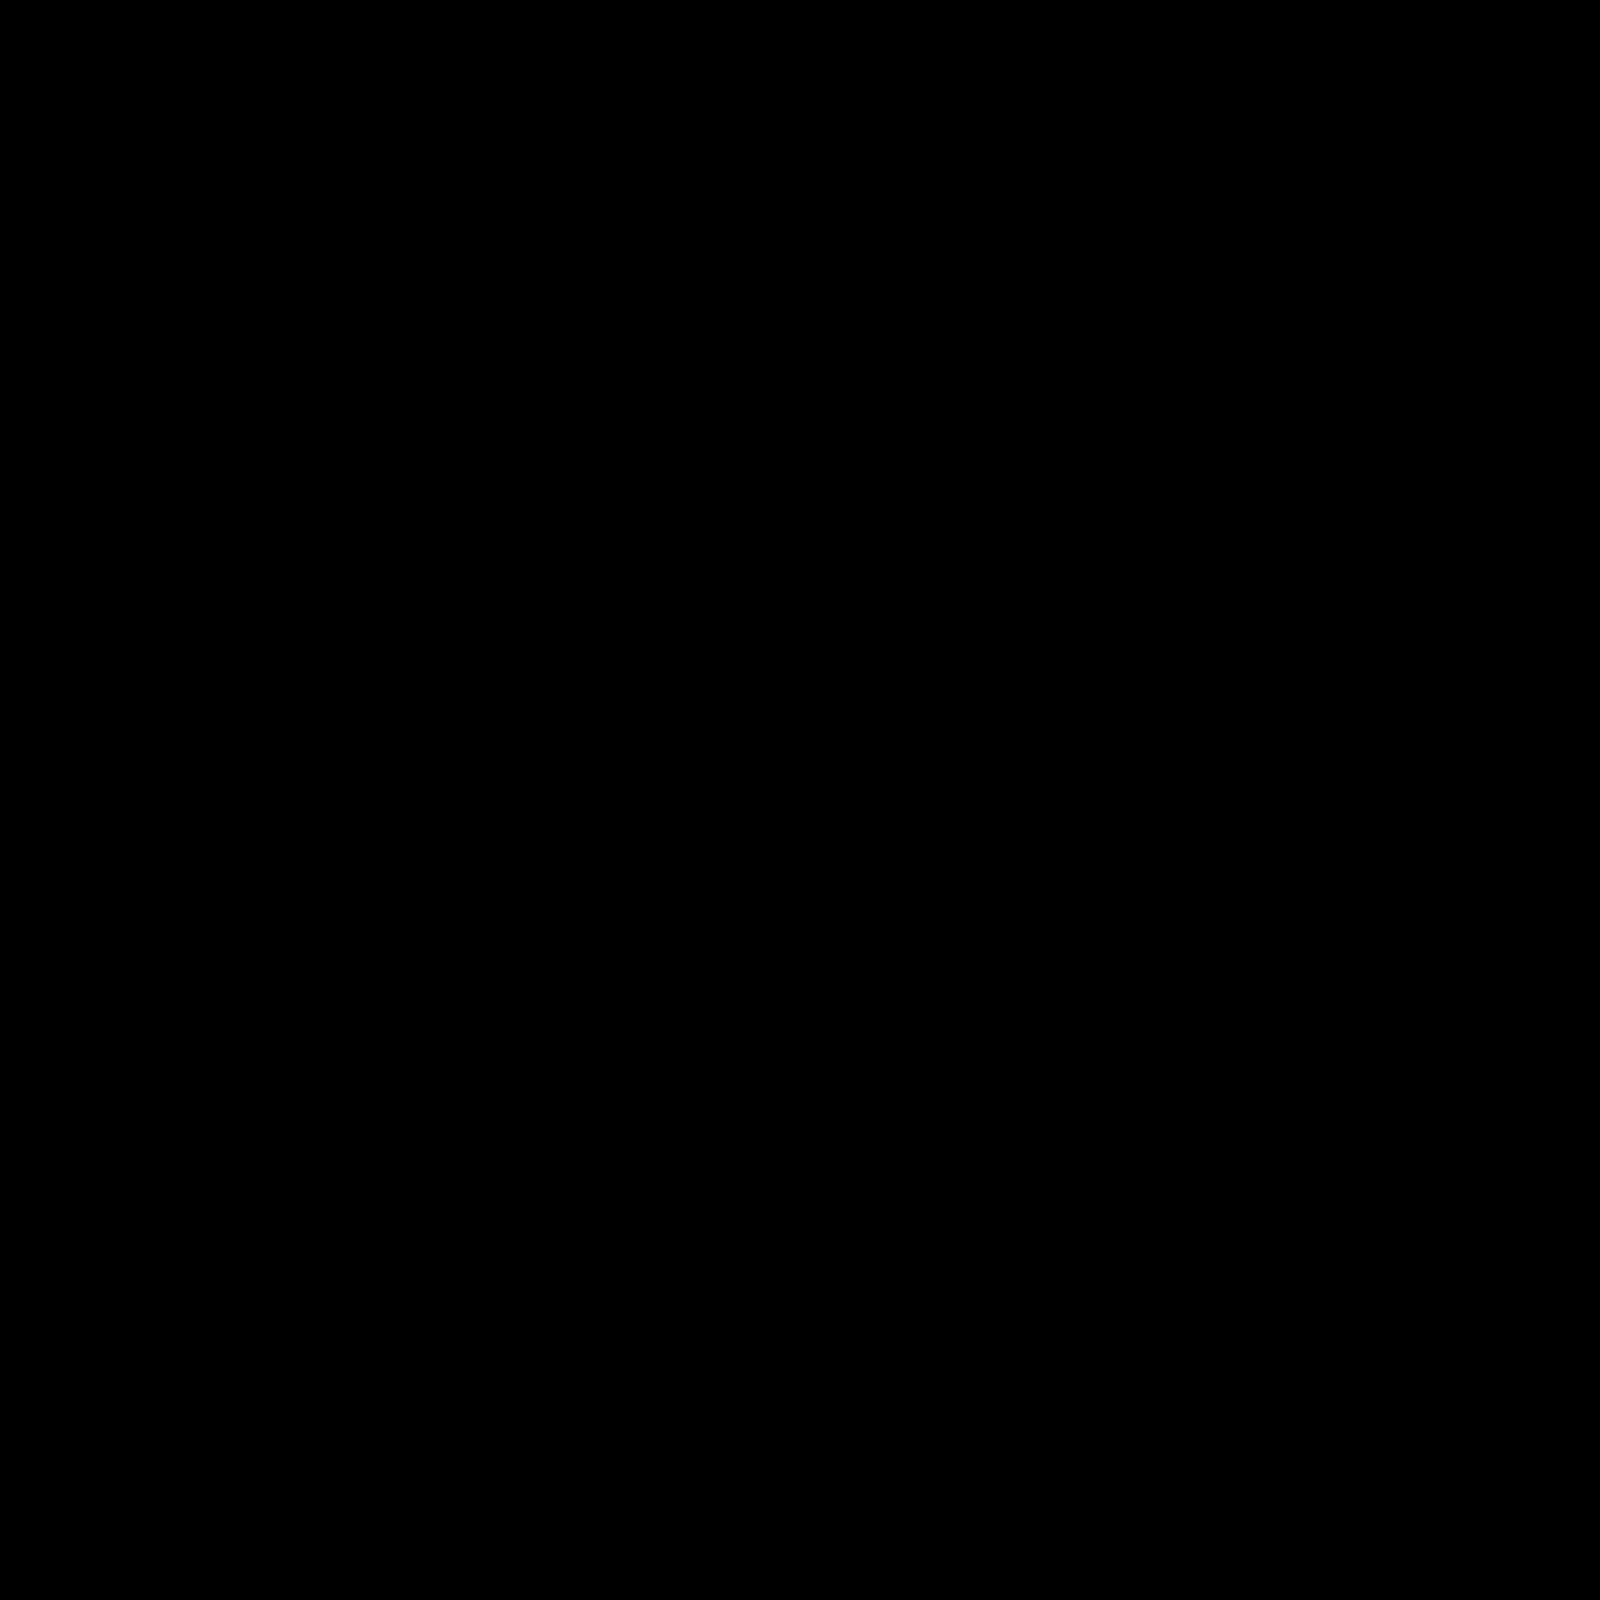 Square Parachute icon